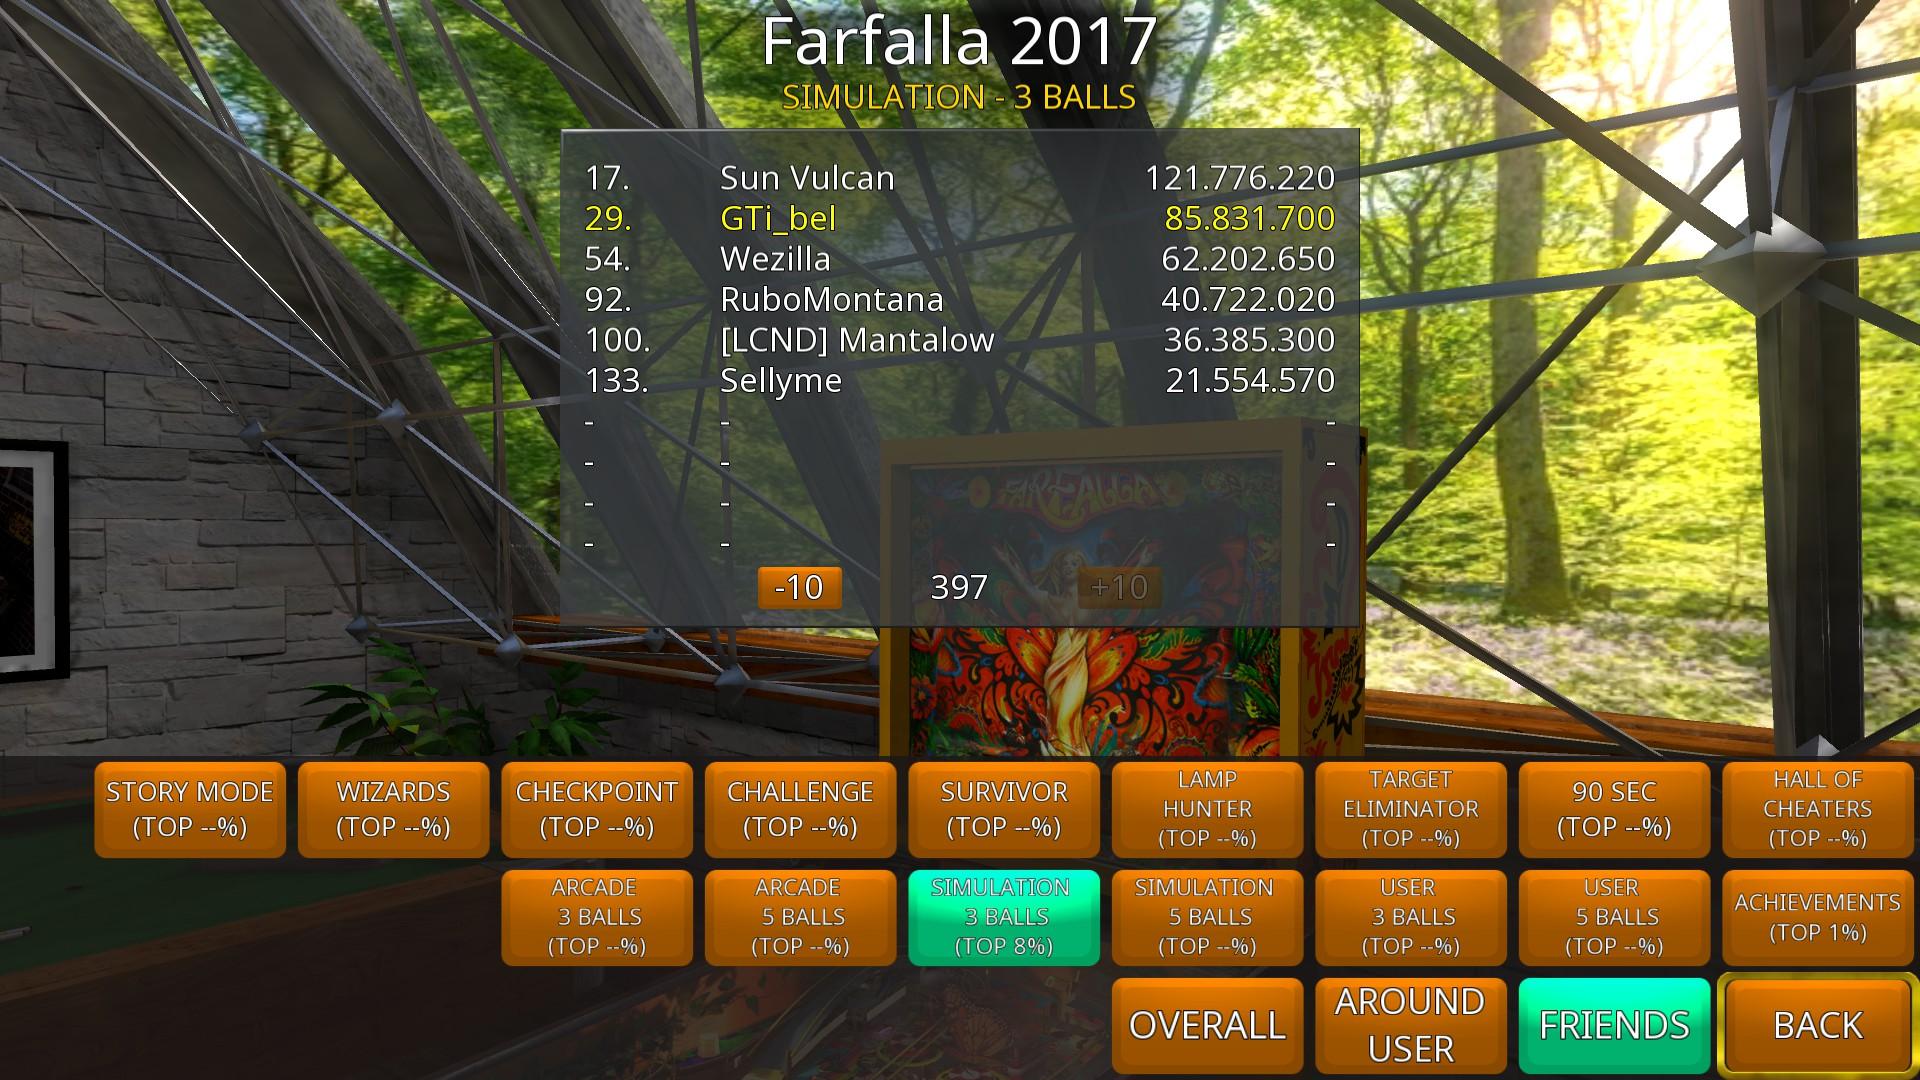 GTibel: Zaccaria Pinball: Farfalla 2017 Table [3 balls] (PC) 85,831,700 points on 2018-08-27 07:42:48